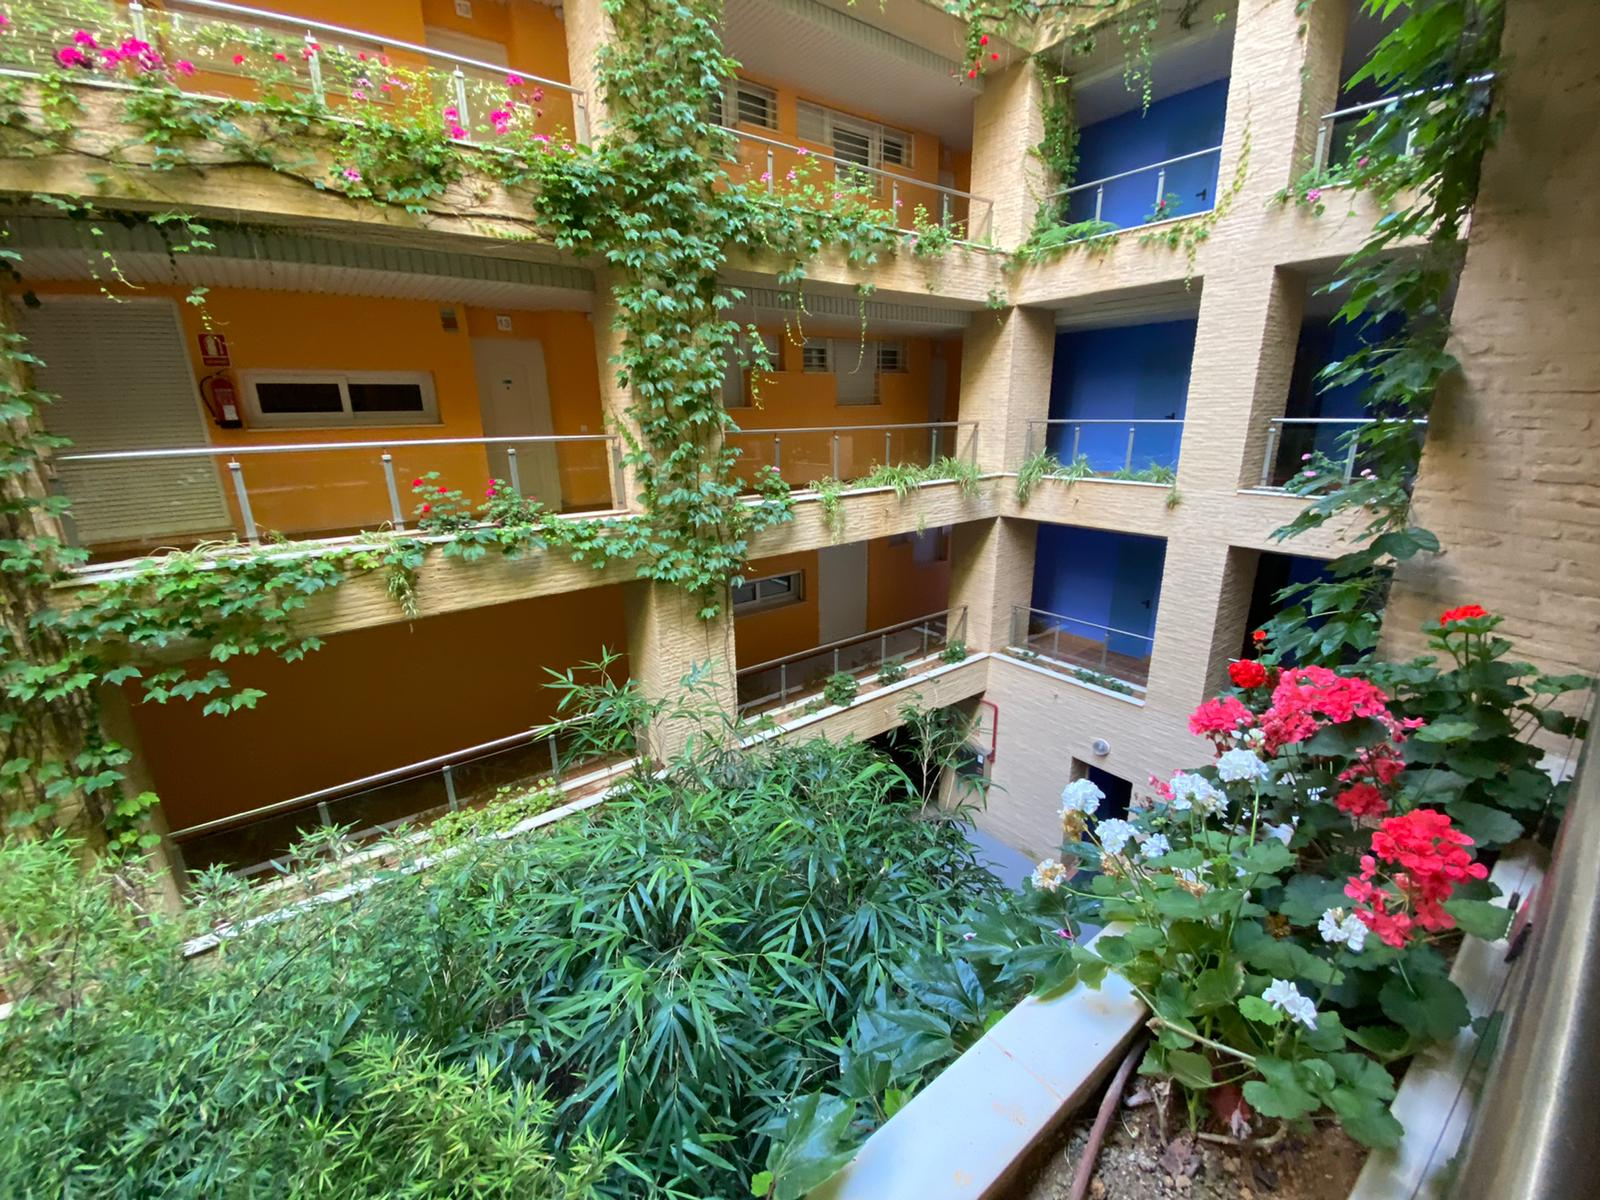 Imagen 32 del Apartamento en El Espigón, 1ª Planta nº4 Poniente (3d+2b), Punta del Moral (HUELVA), Paseo de la Cruz nº22